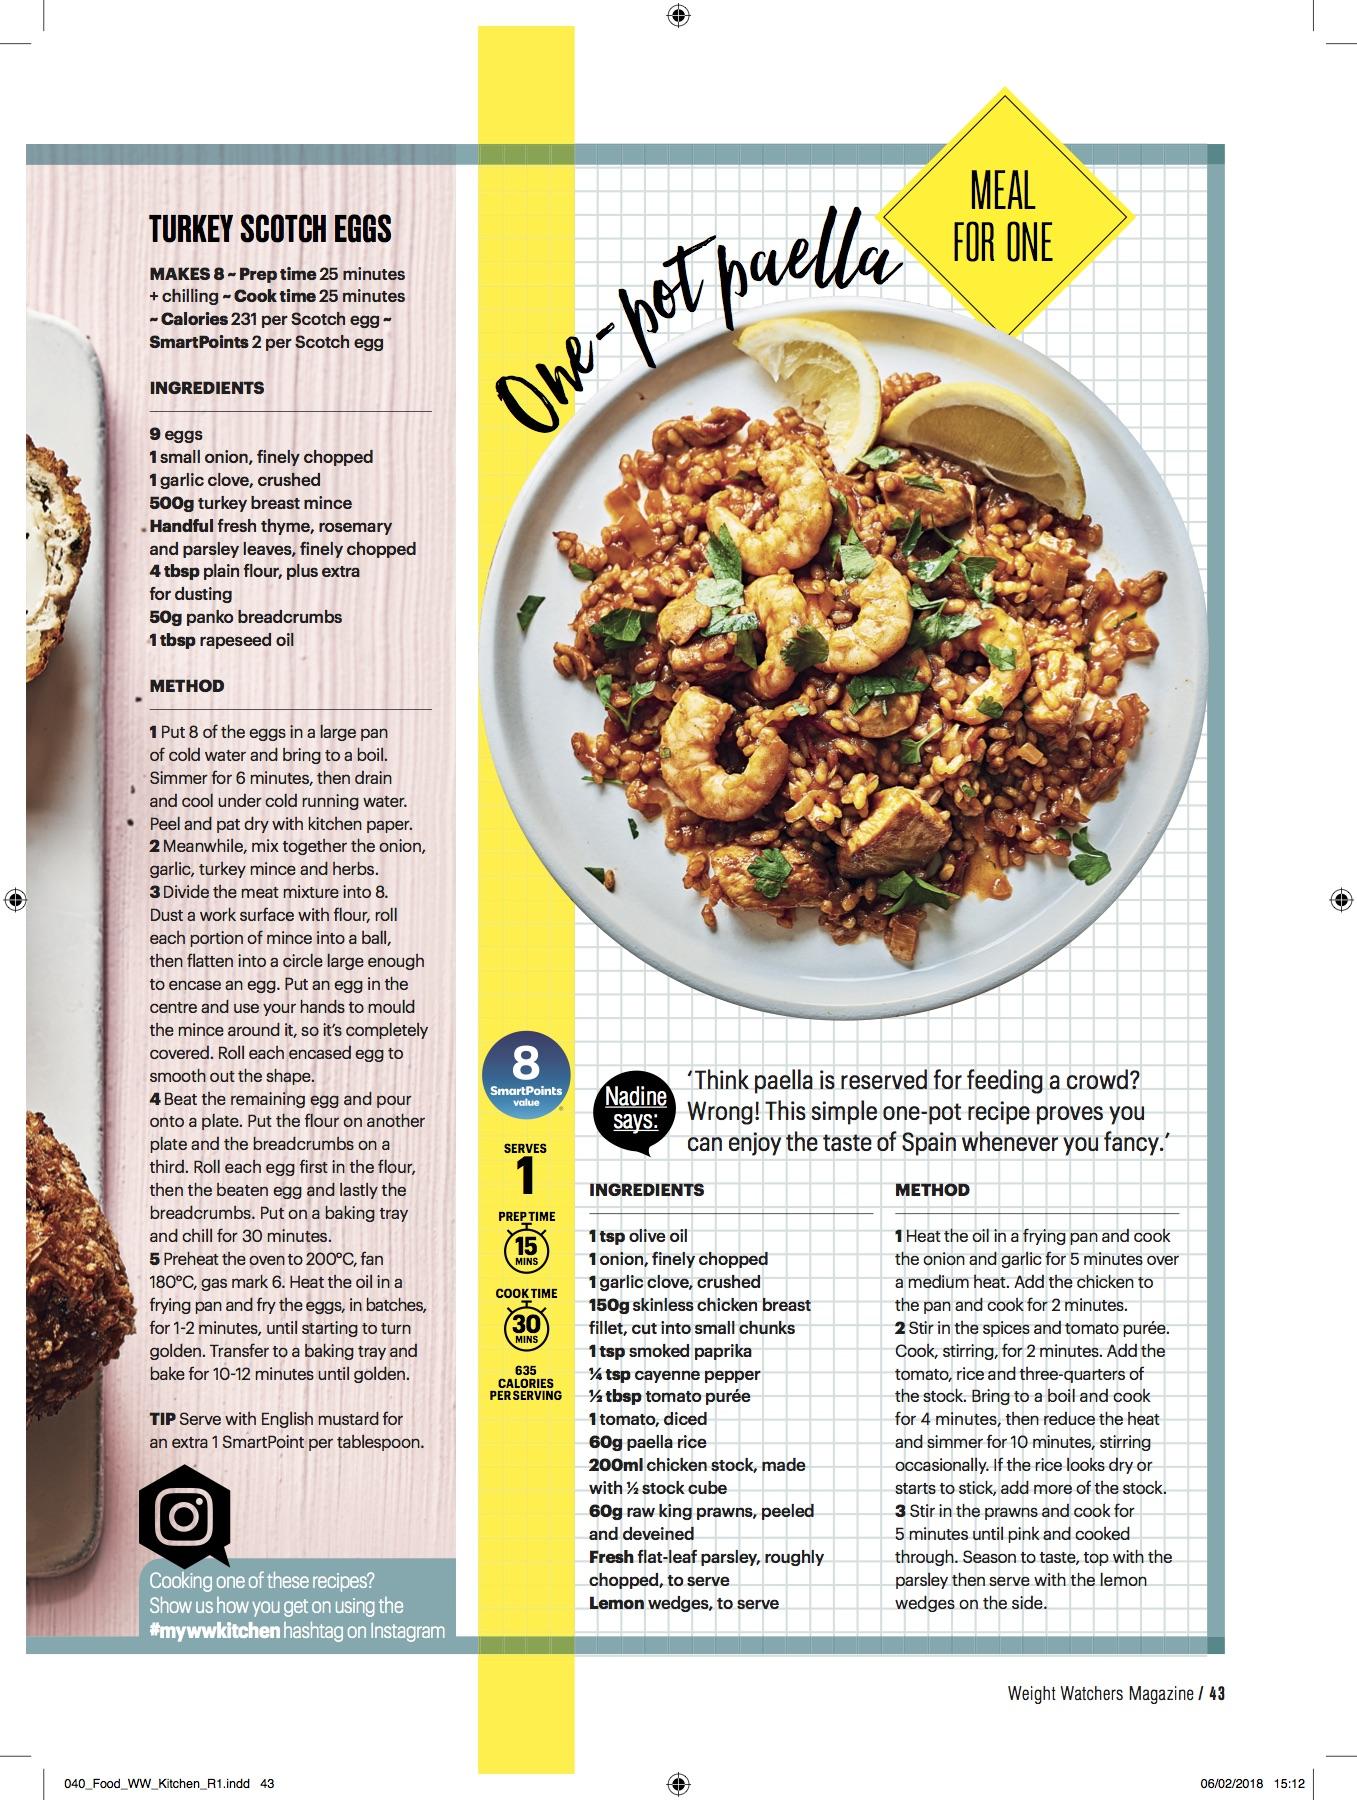 Publication: Weight Watchers magazine April 2018  Photographer: Ria Osborne  Food stylist: Ella Tarn  Prop stylist: Rebecca Newport